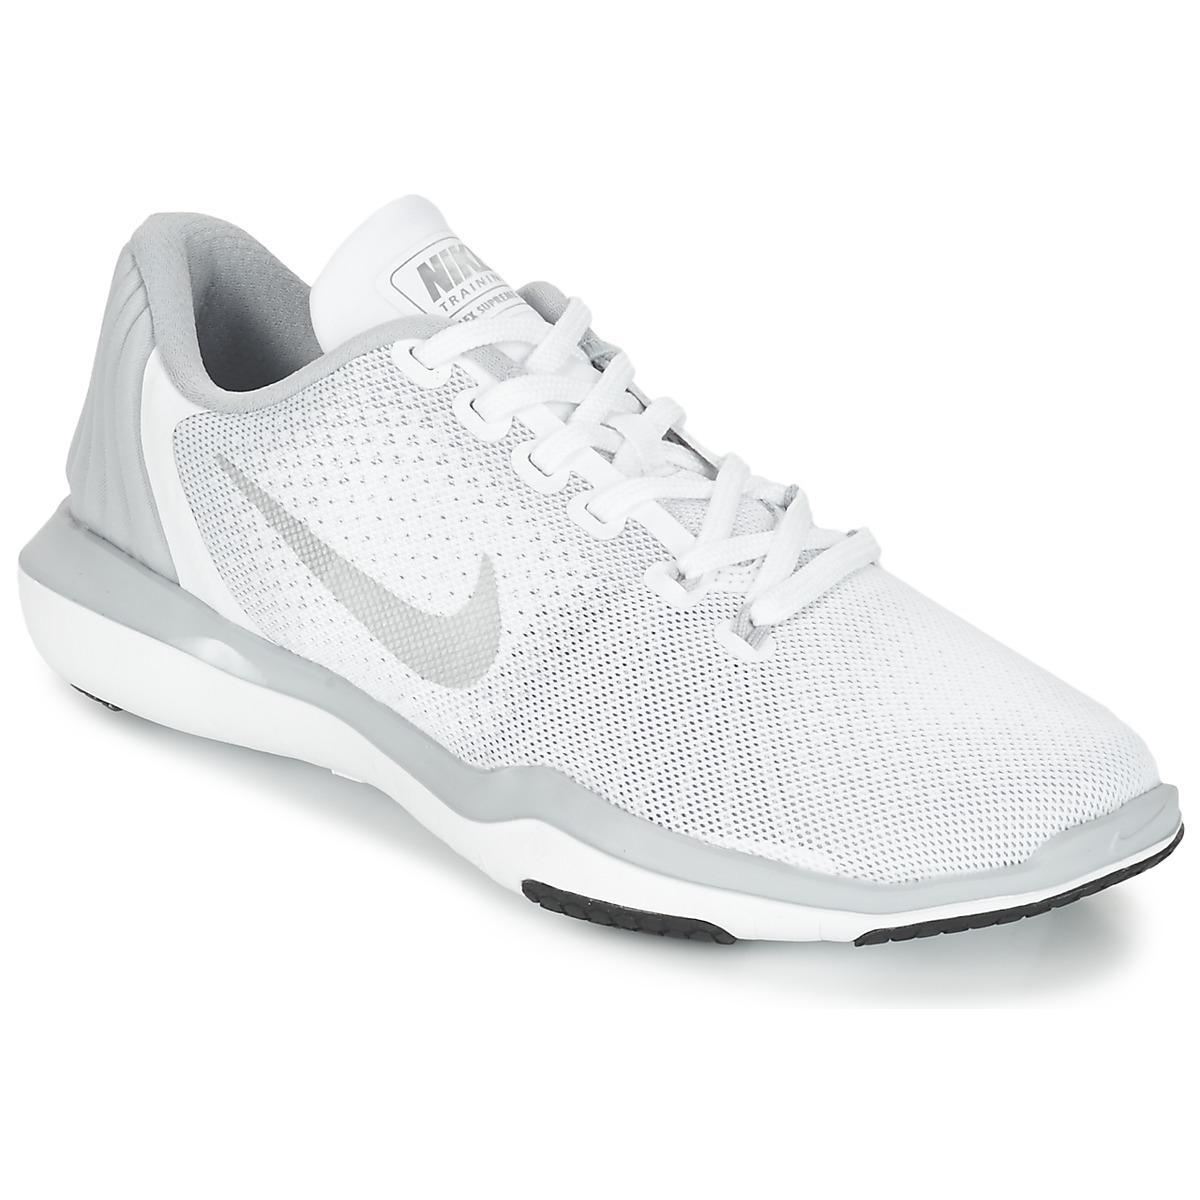 ef99fd83a90a Nike Flex Supreme Trainer 5 W Trainers in White - Lyst